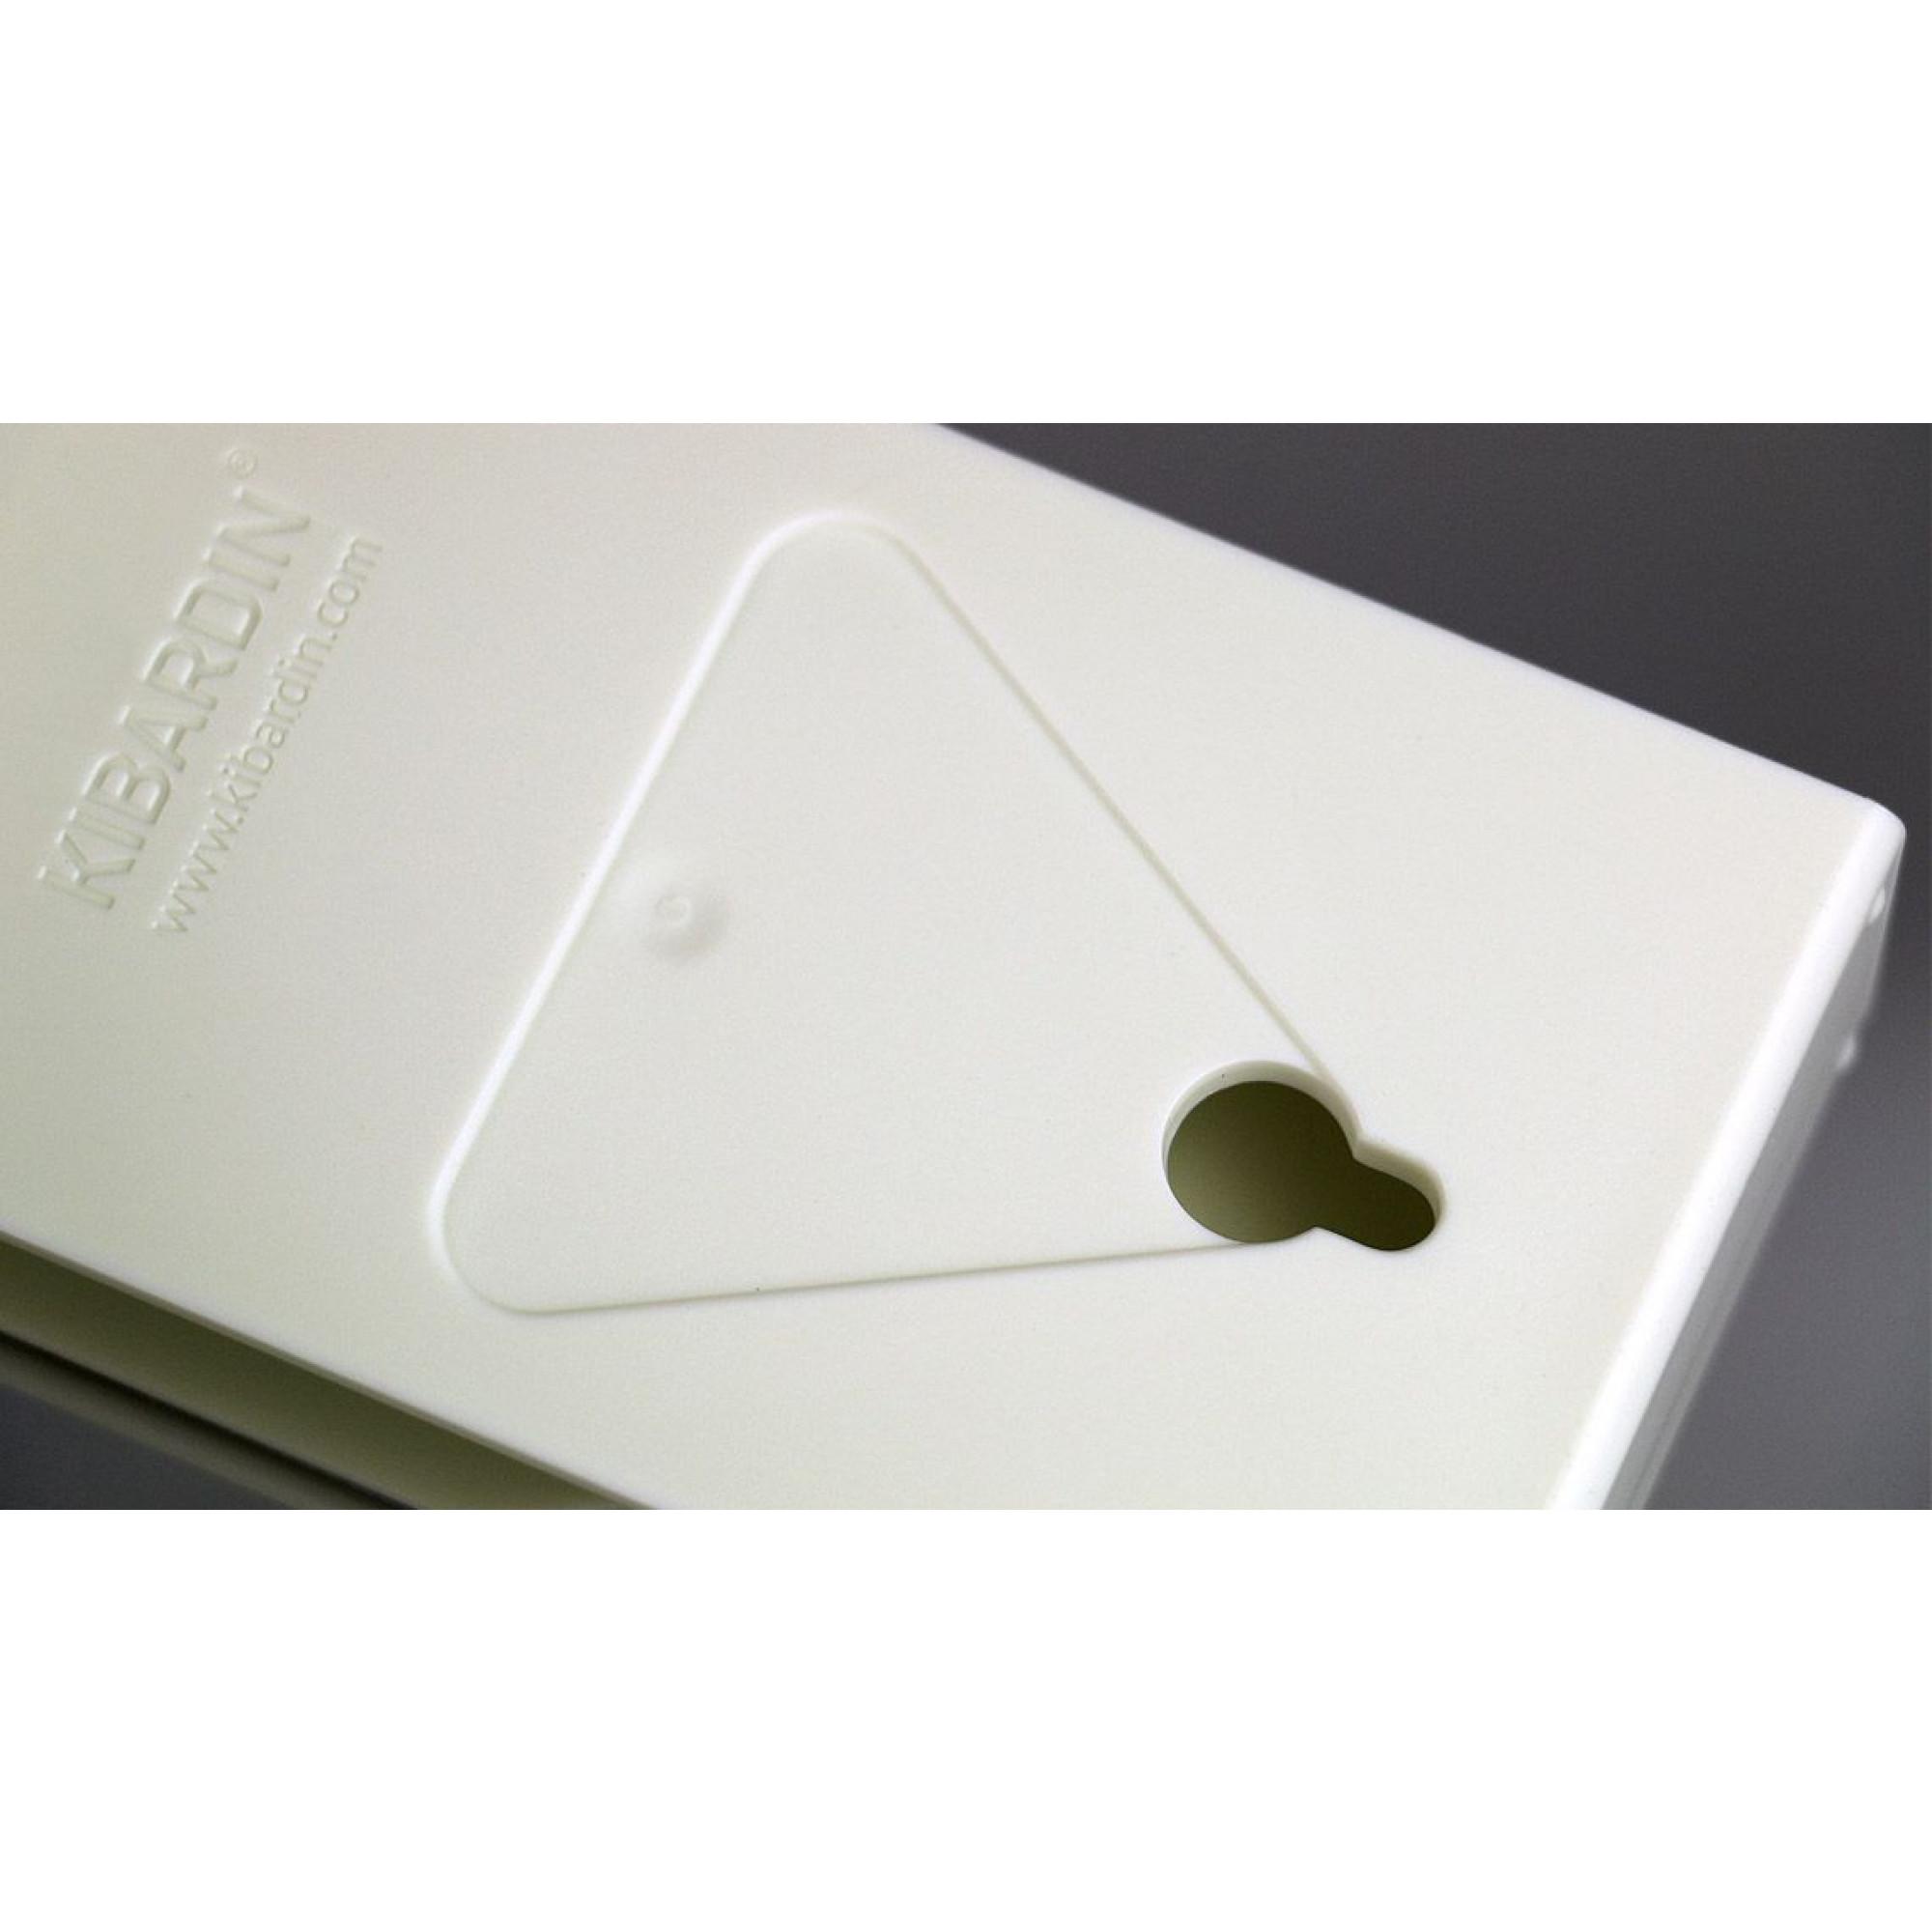 Desk/Wall Foldable Analog Clock Transformer   White & White